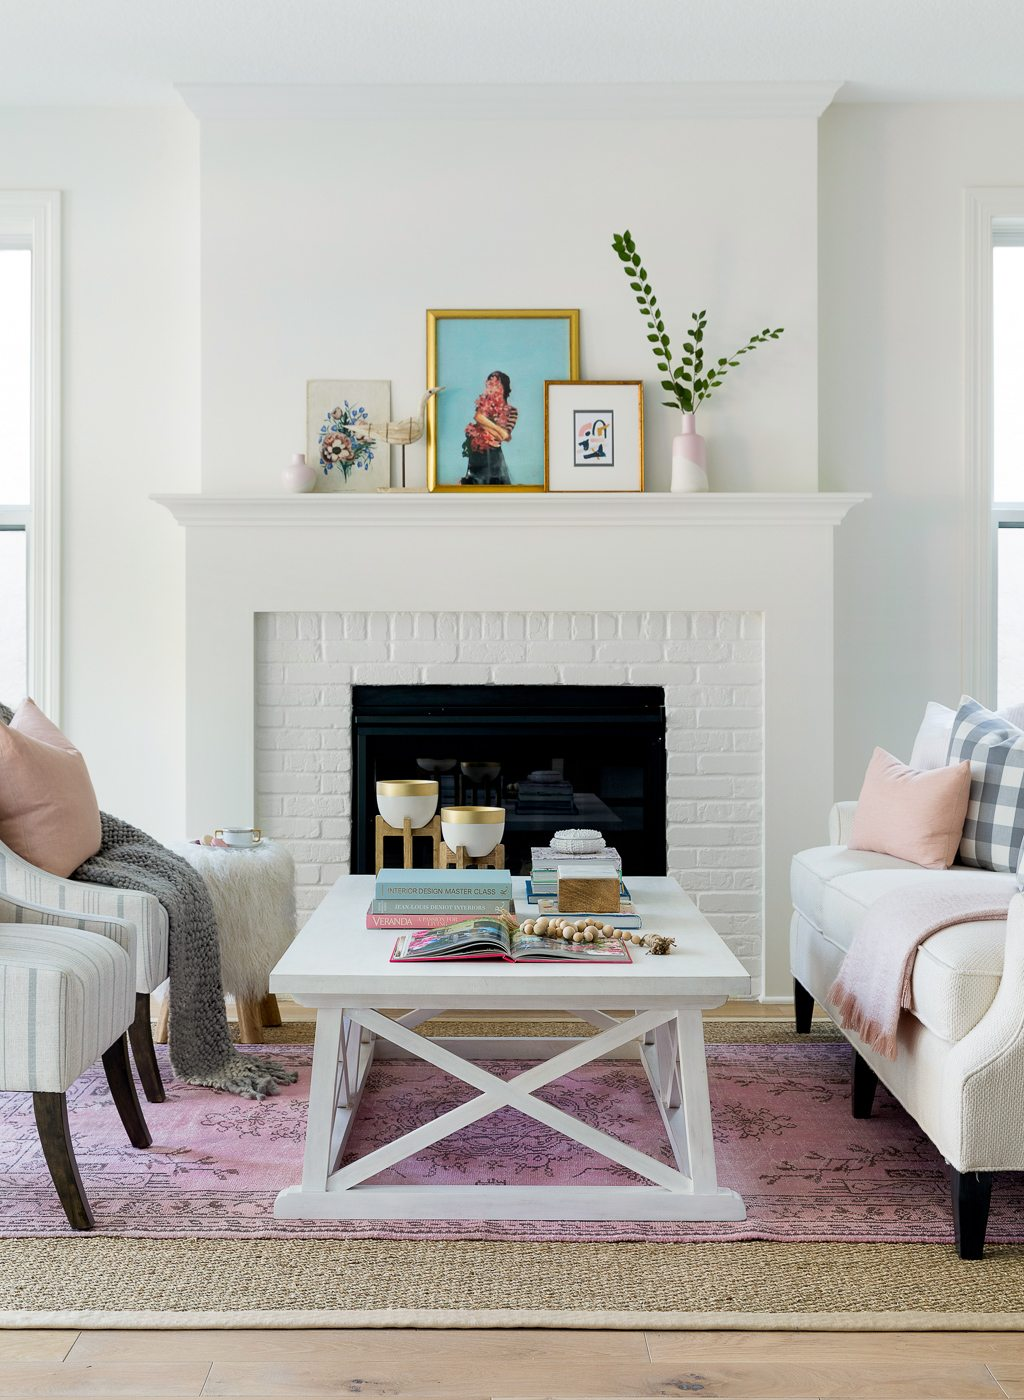 Our Favorite Neutral Paint Colors | Bria Hammel Interiors | Bria ...